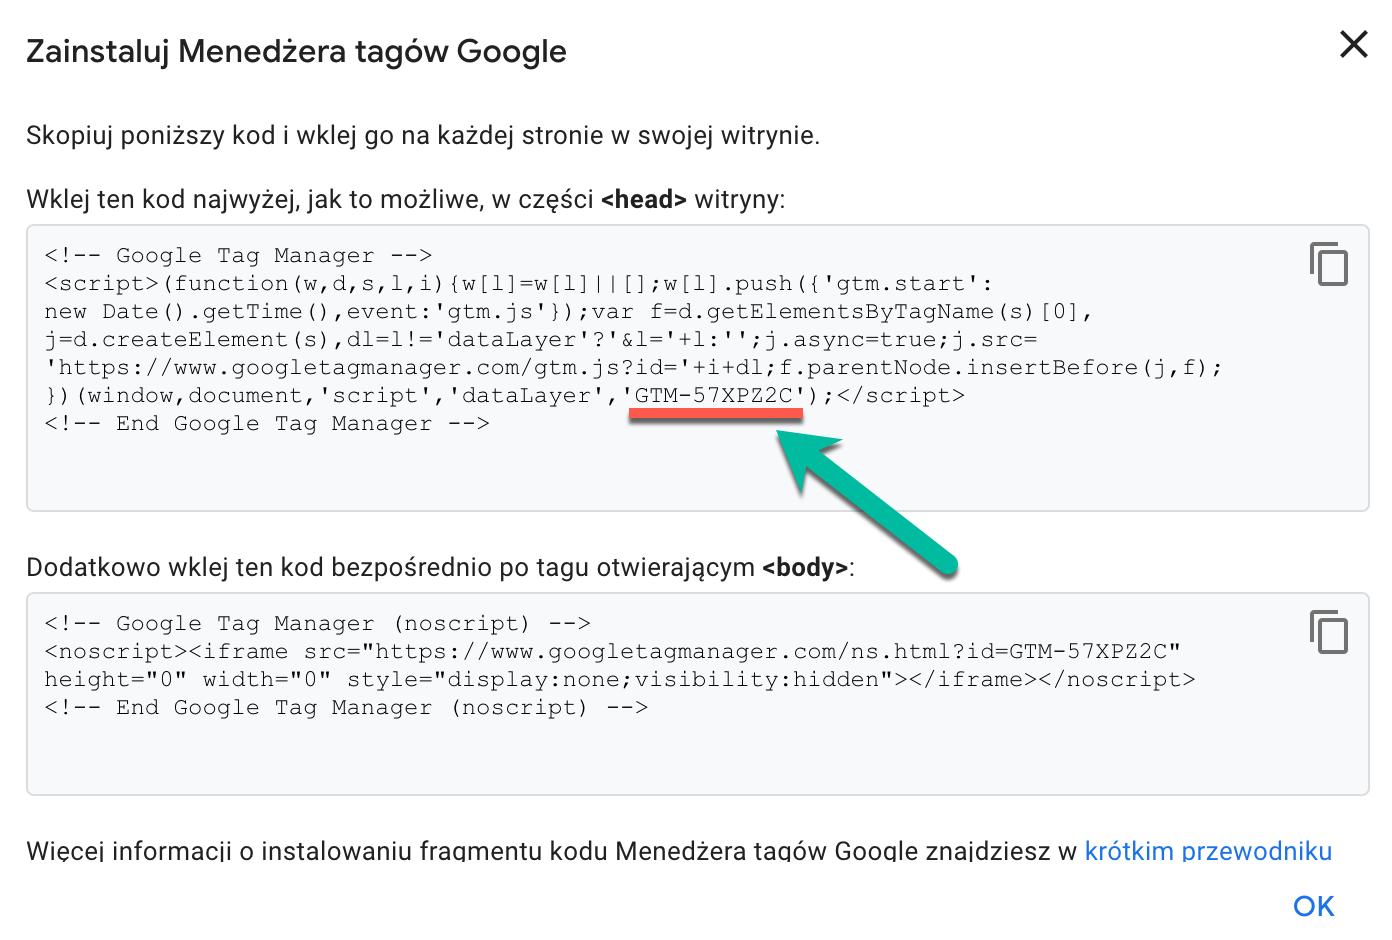 Identyfikator kontenera menedżera tagów google.